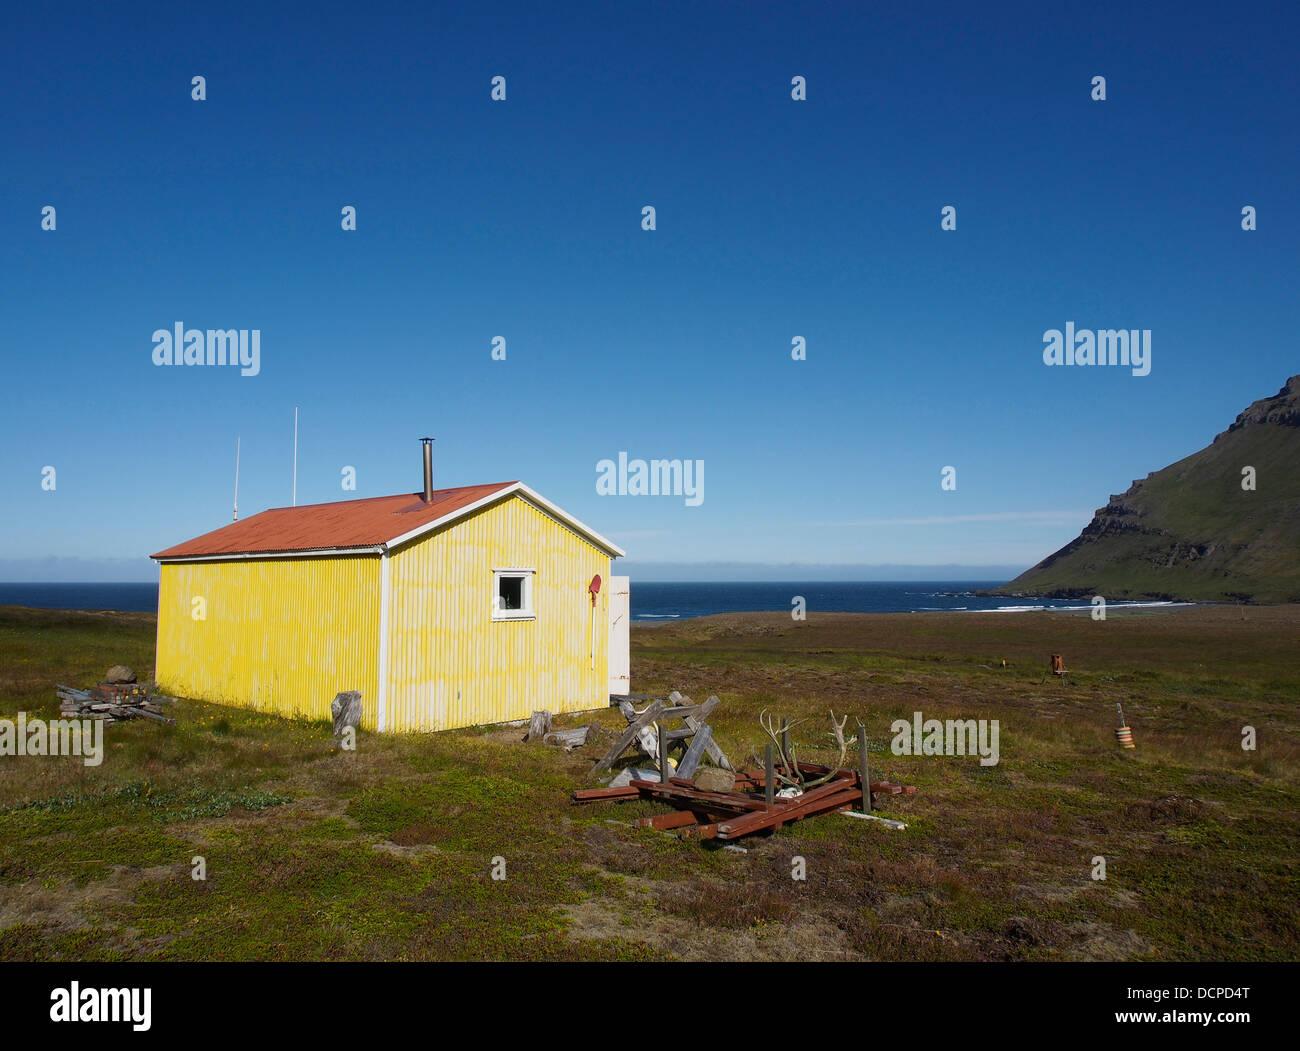 Emergency hut, Sandvík, Iceland - Stock Image